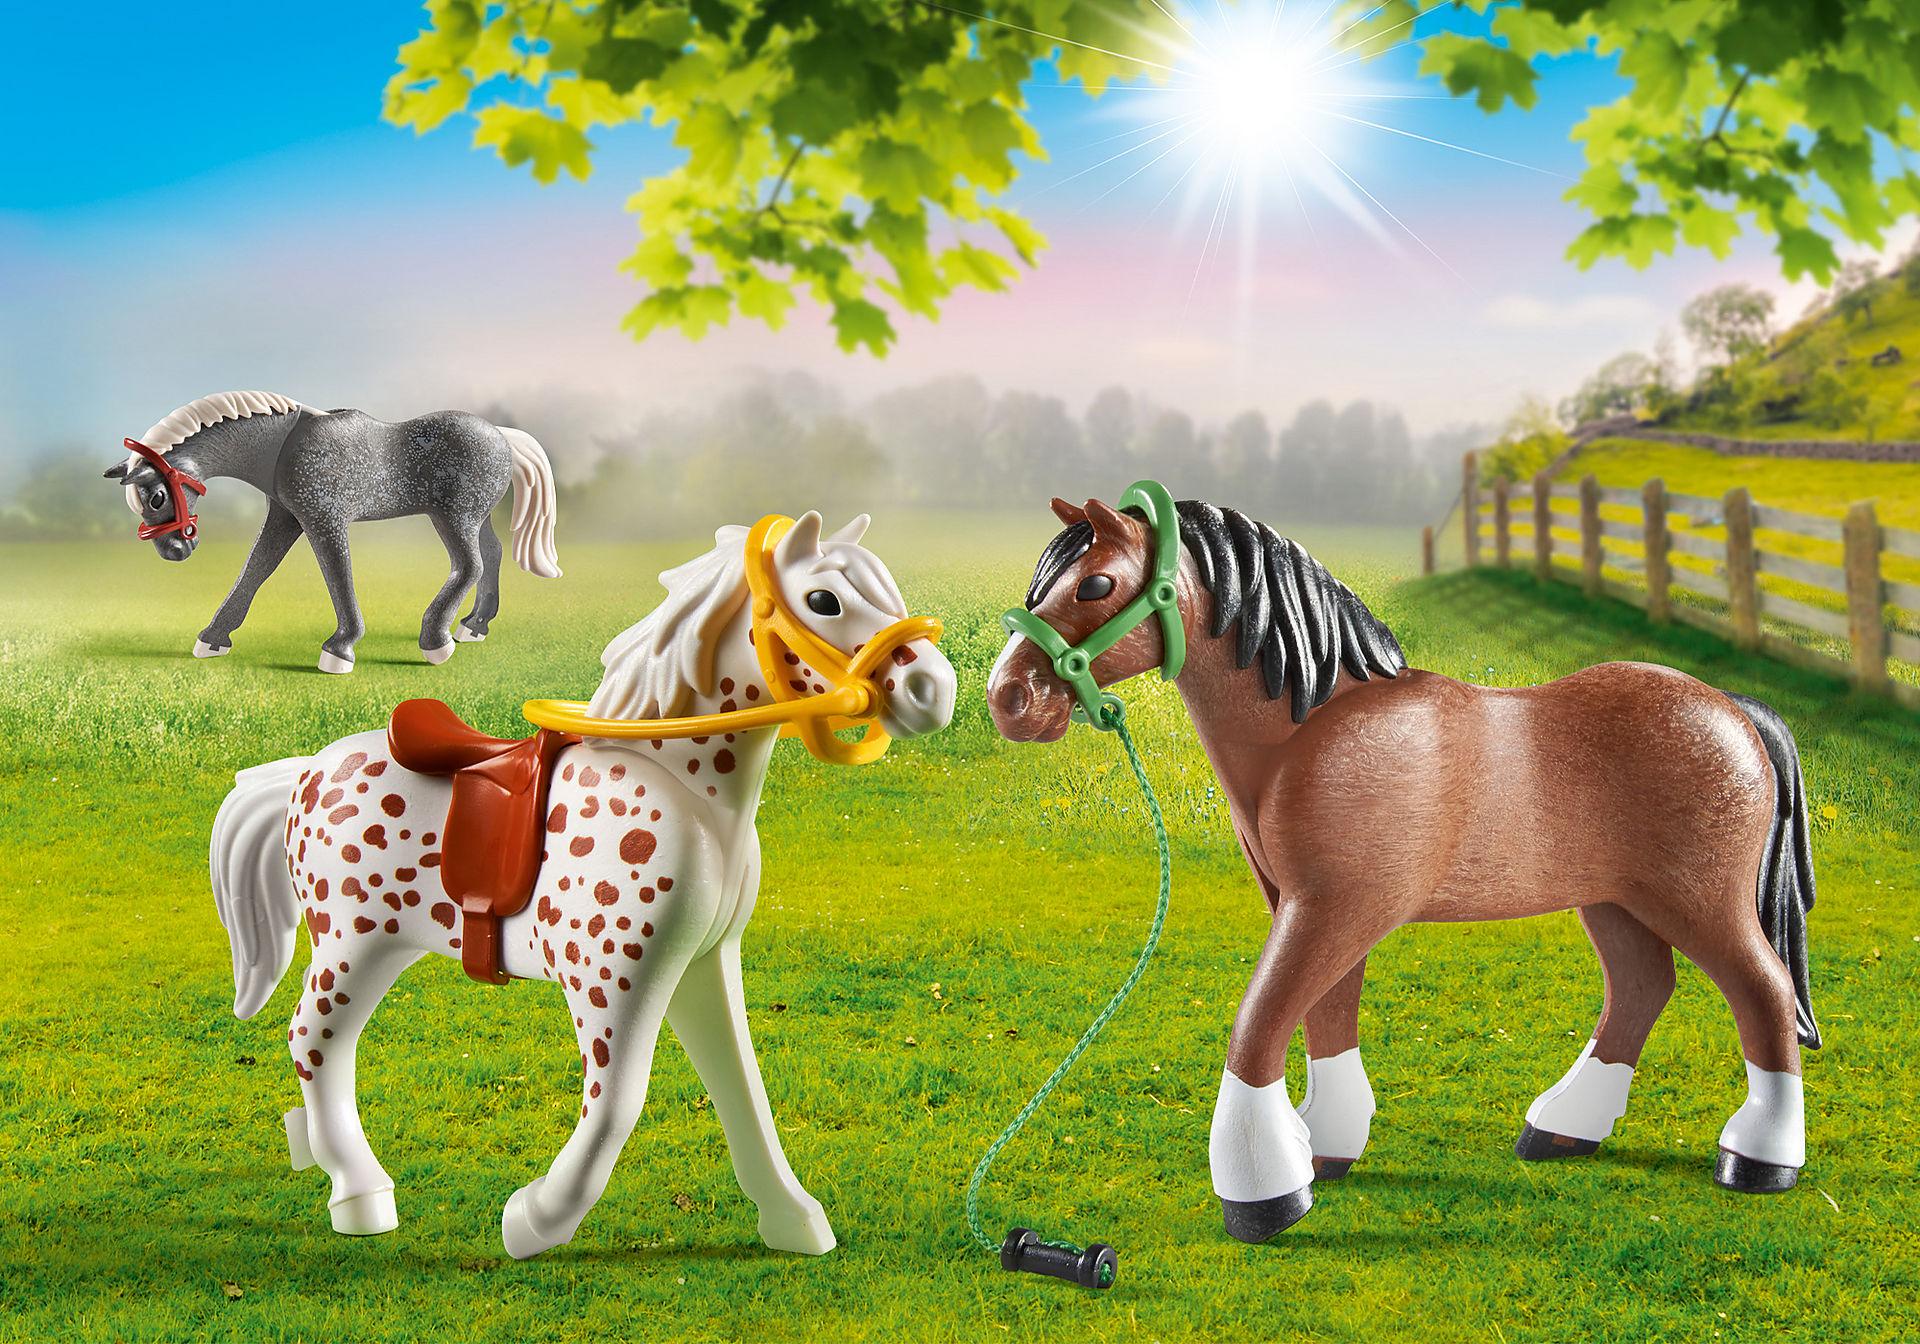 70683 3 chevaux zoom image1